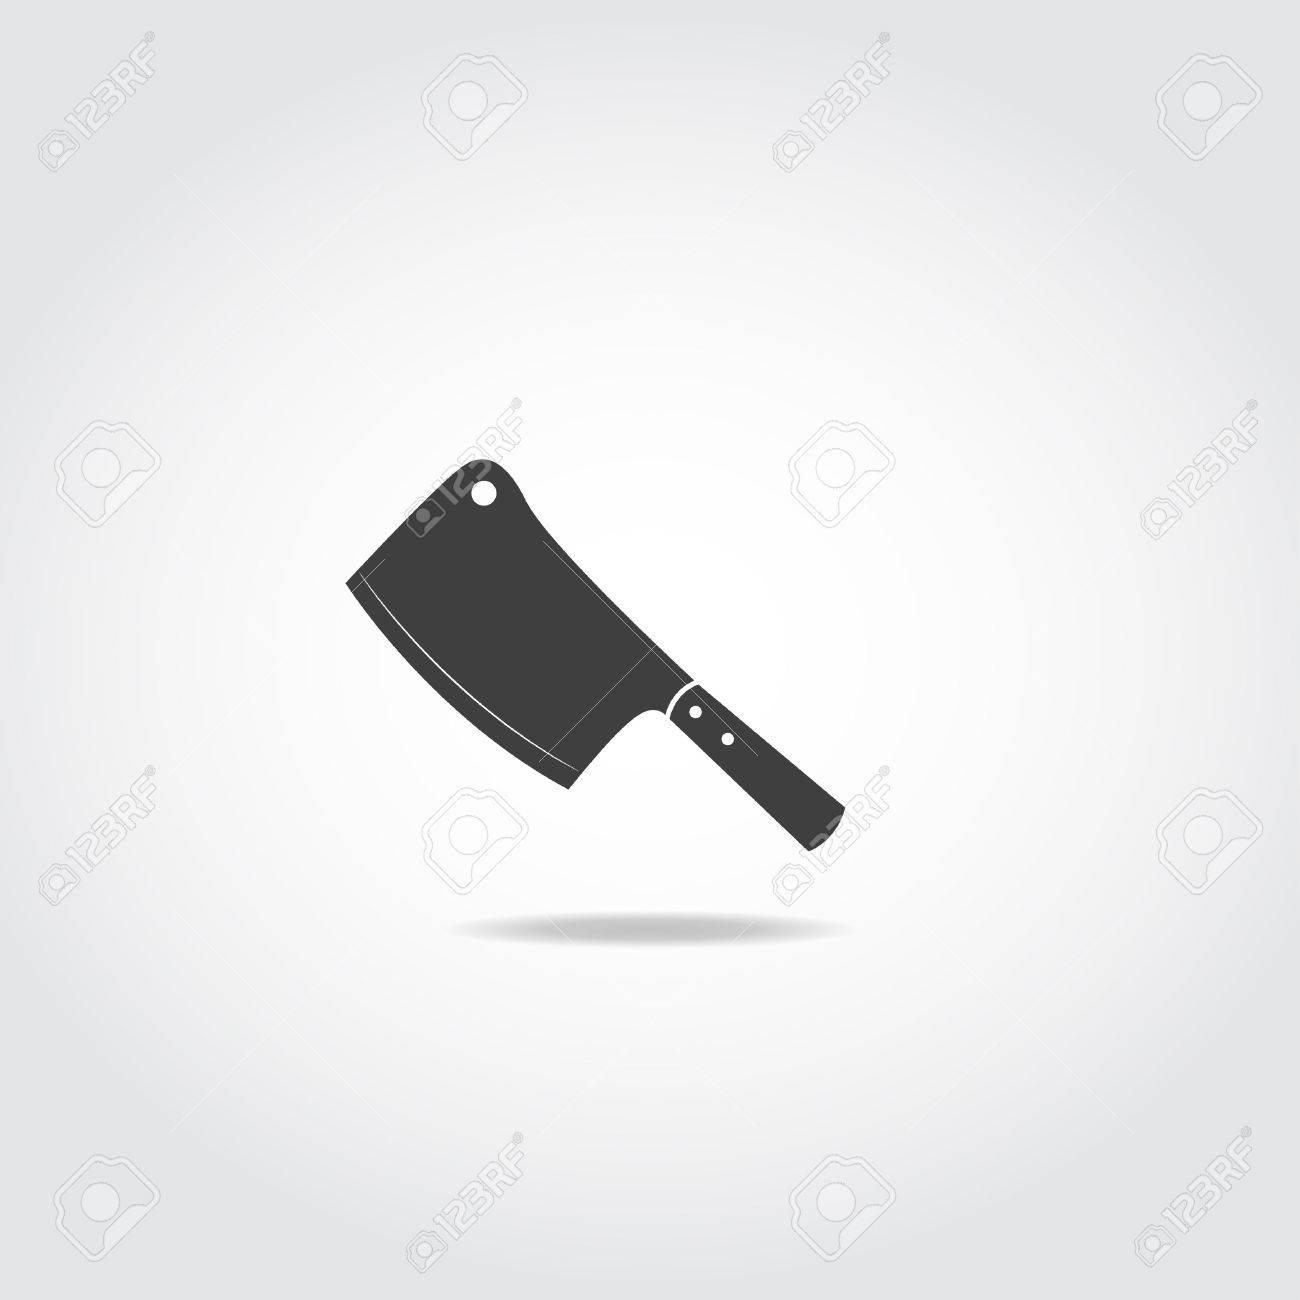 restaurant sharp knife icon two black butcher knife royalty free